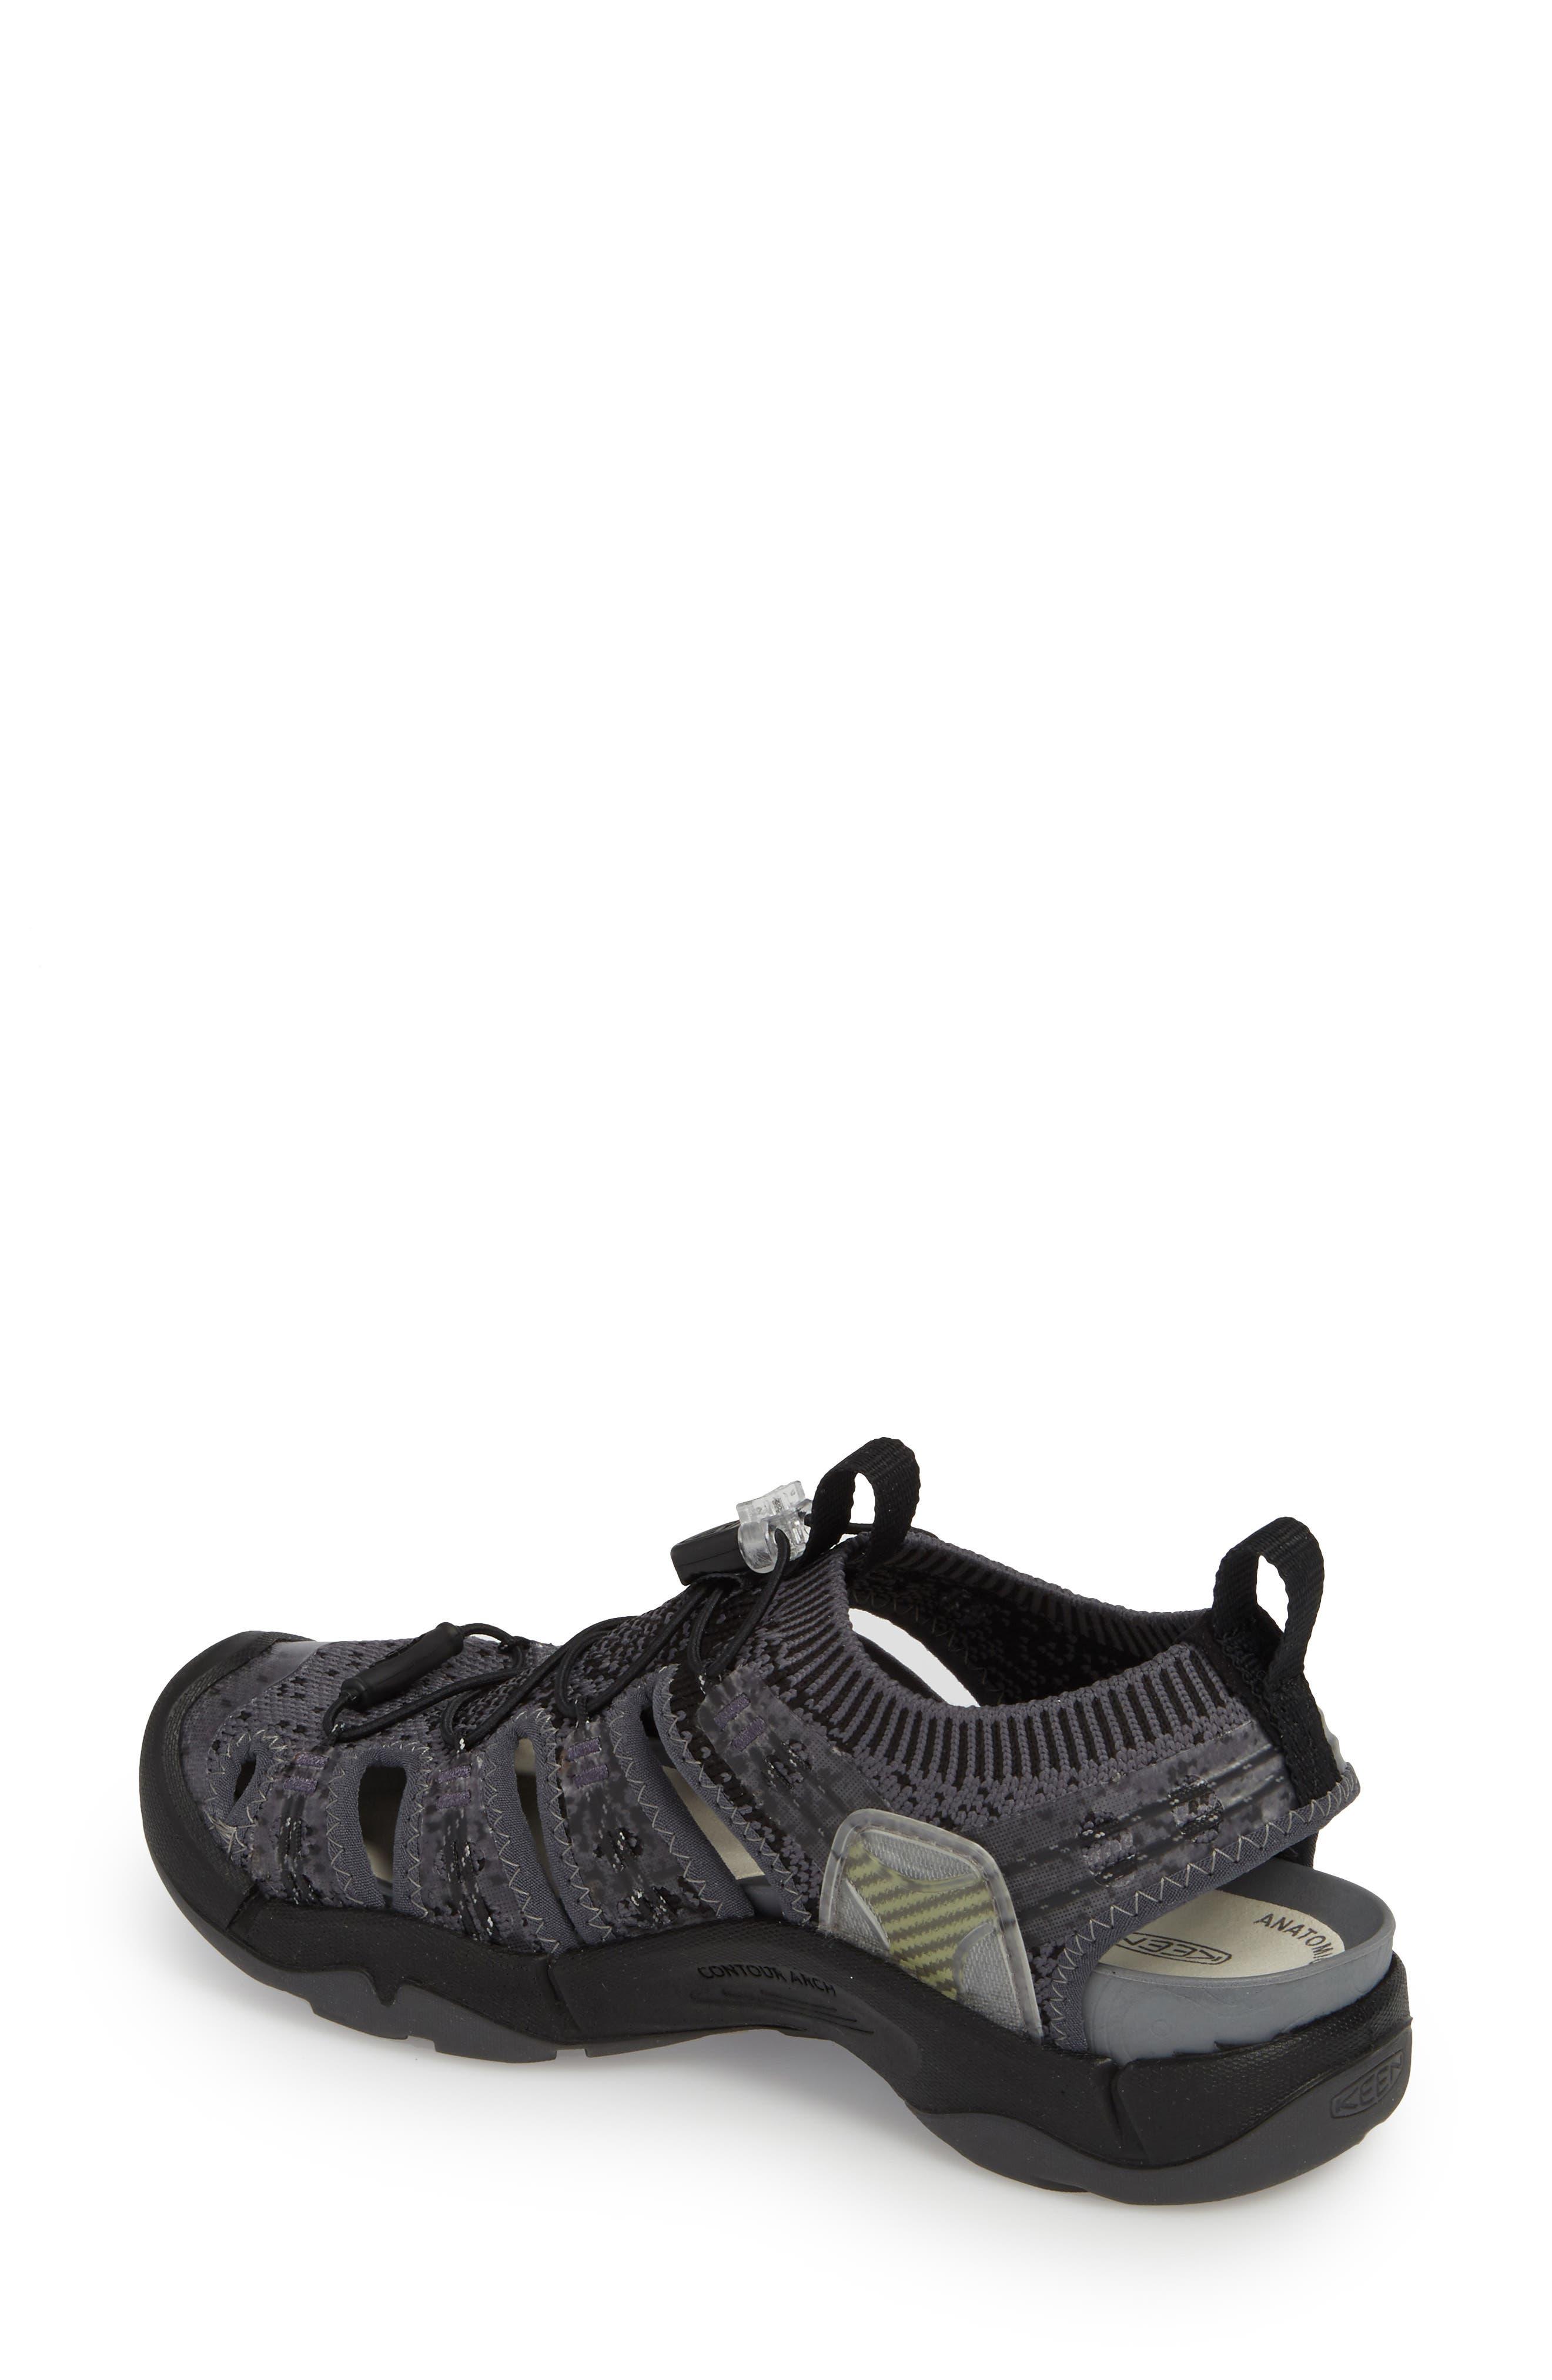 KEEN, EVOFIT One Sandal, Alternate thumbnail 2, color, HEATHERED BLACK/ MAGNET